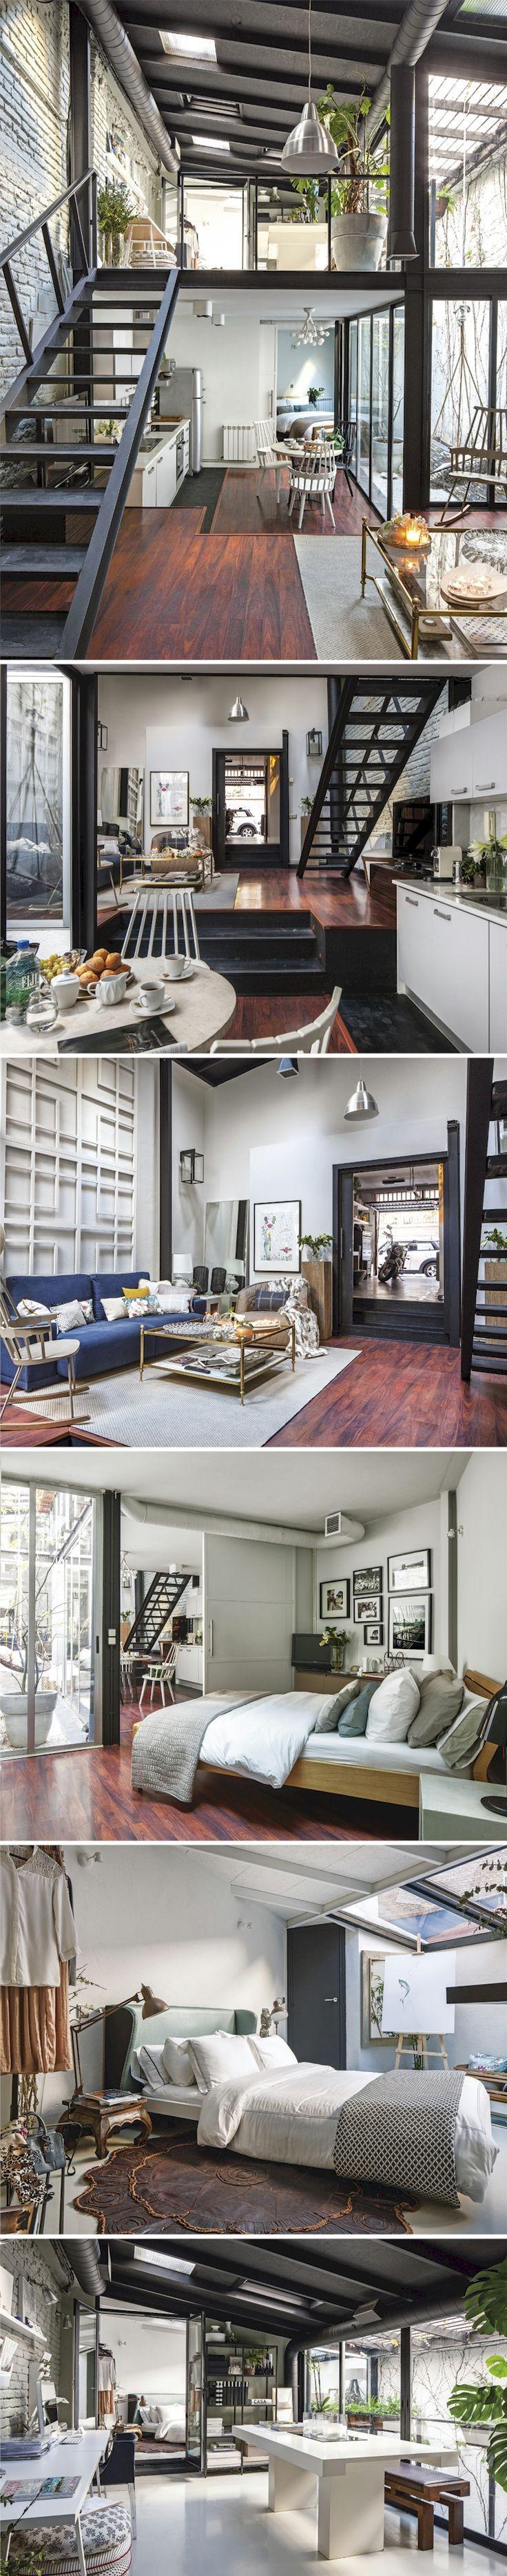 A workshop turned into a modern loft in Madrid, Spain, by interior designer Celia G�mez